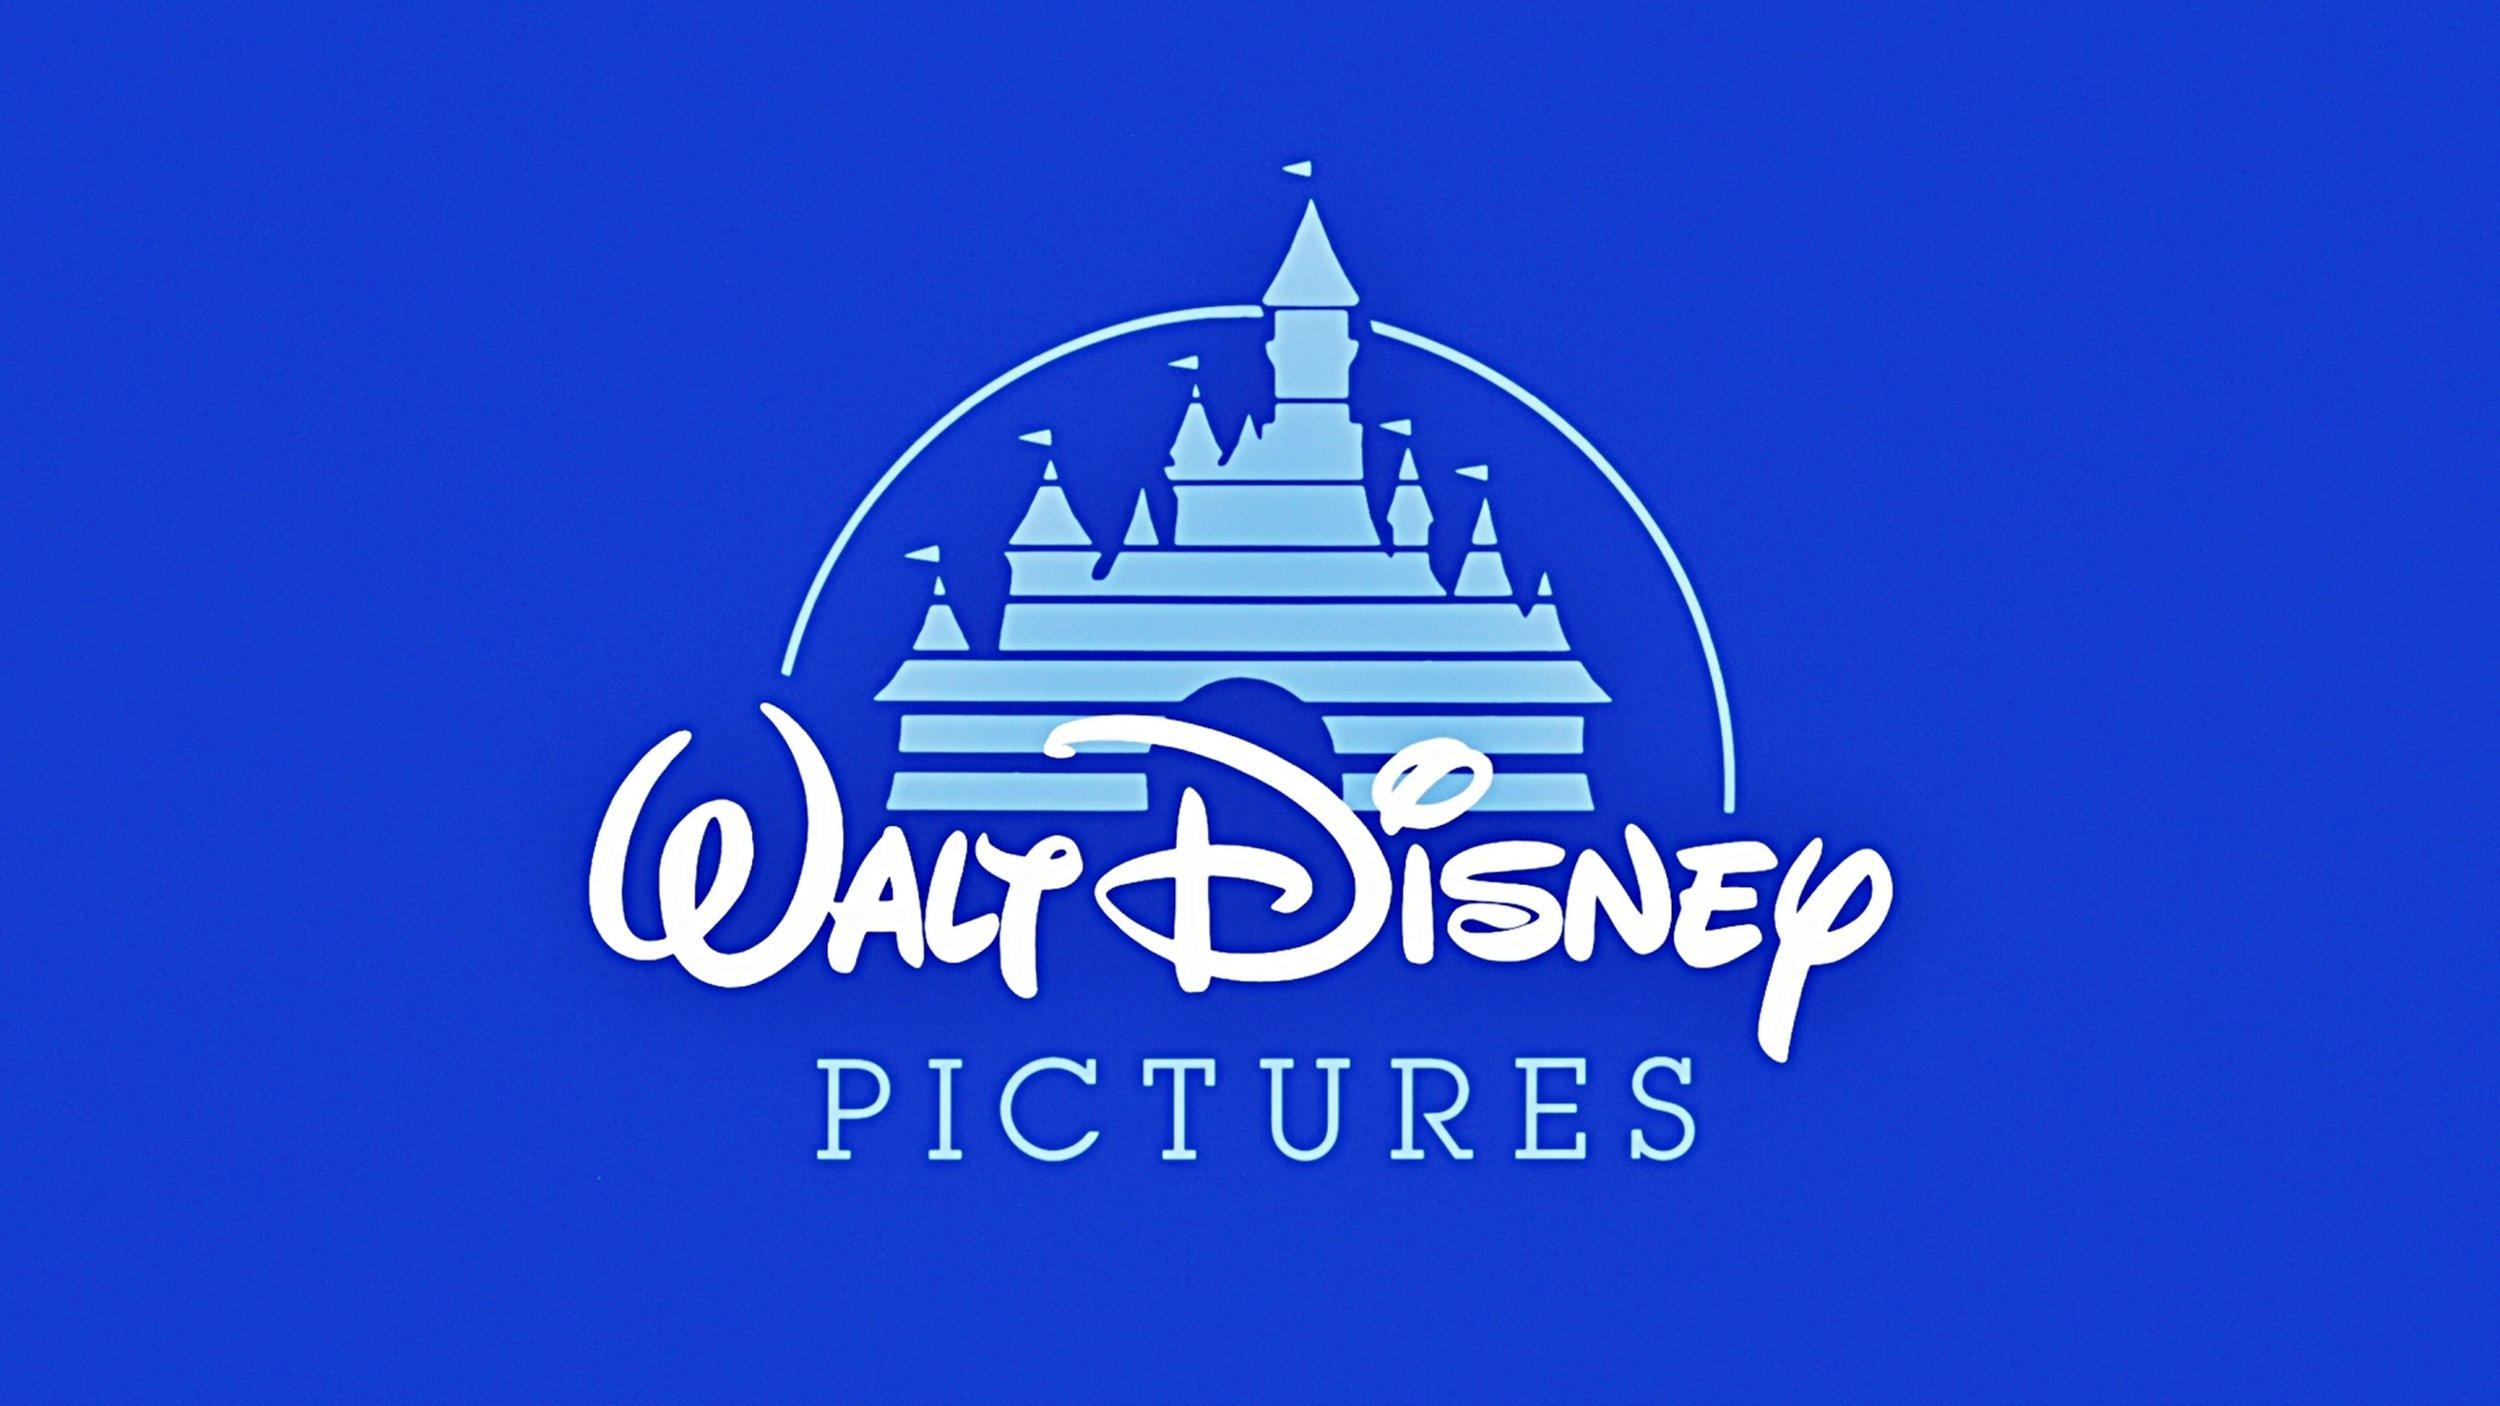 waltdisney_logo.jpg